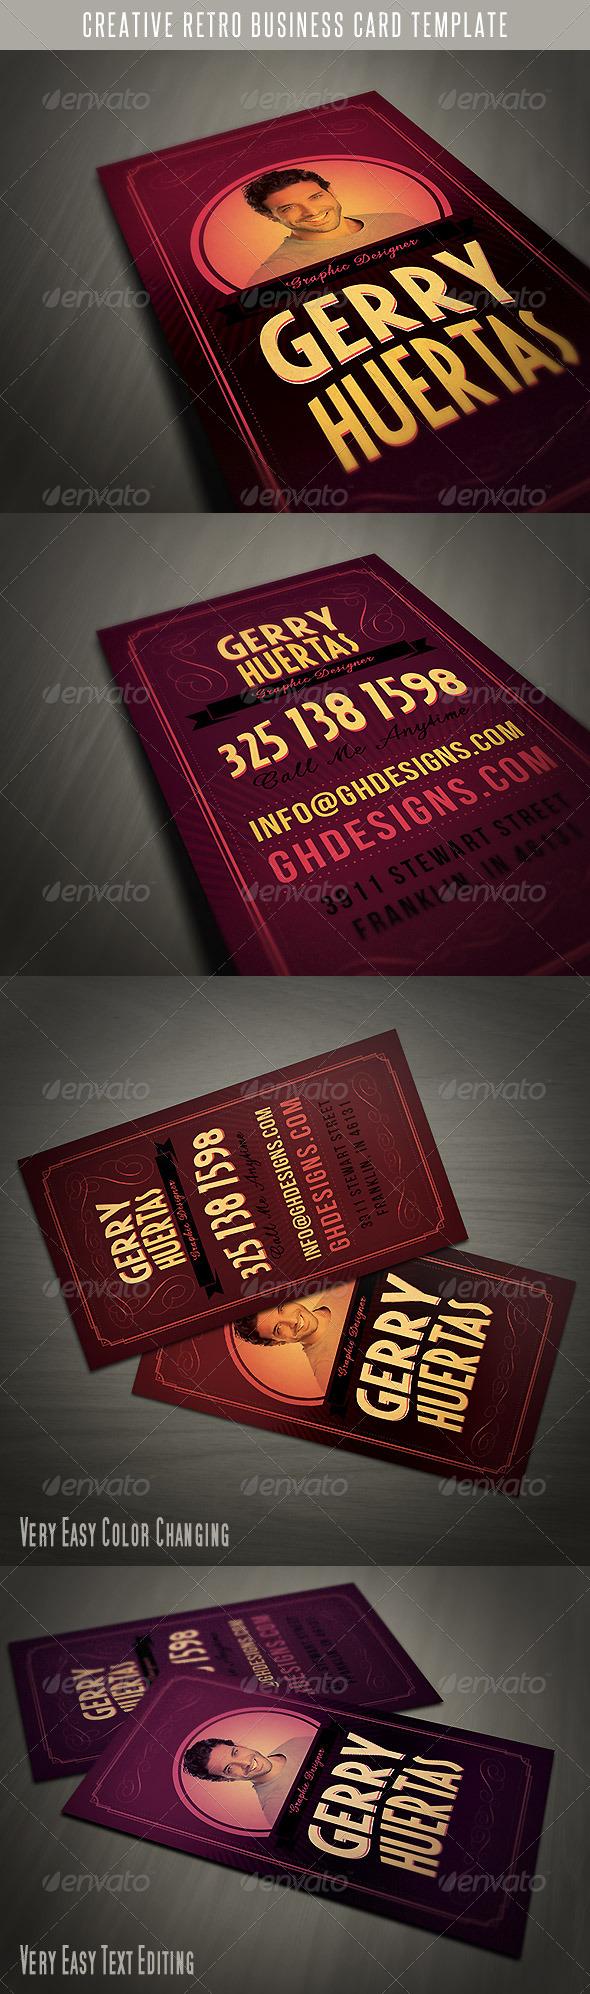 Creative Retro Business Card - Retro/Vintage Business Cards